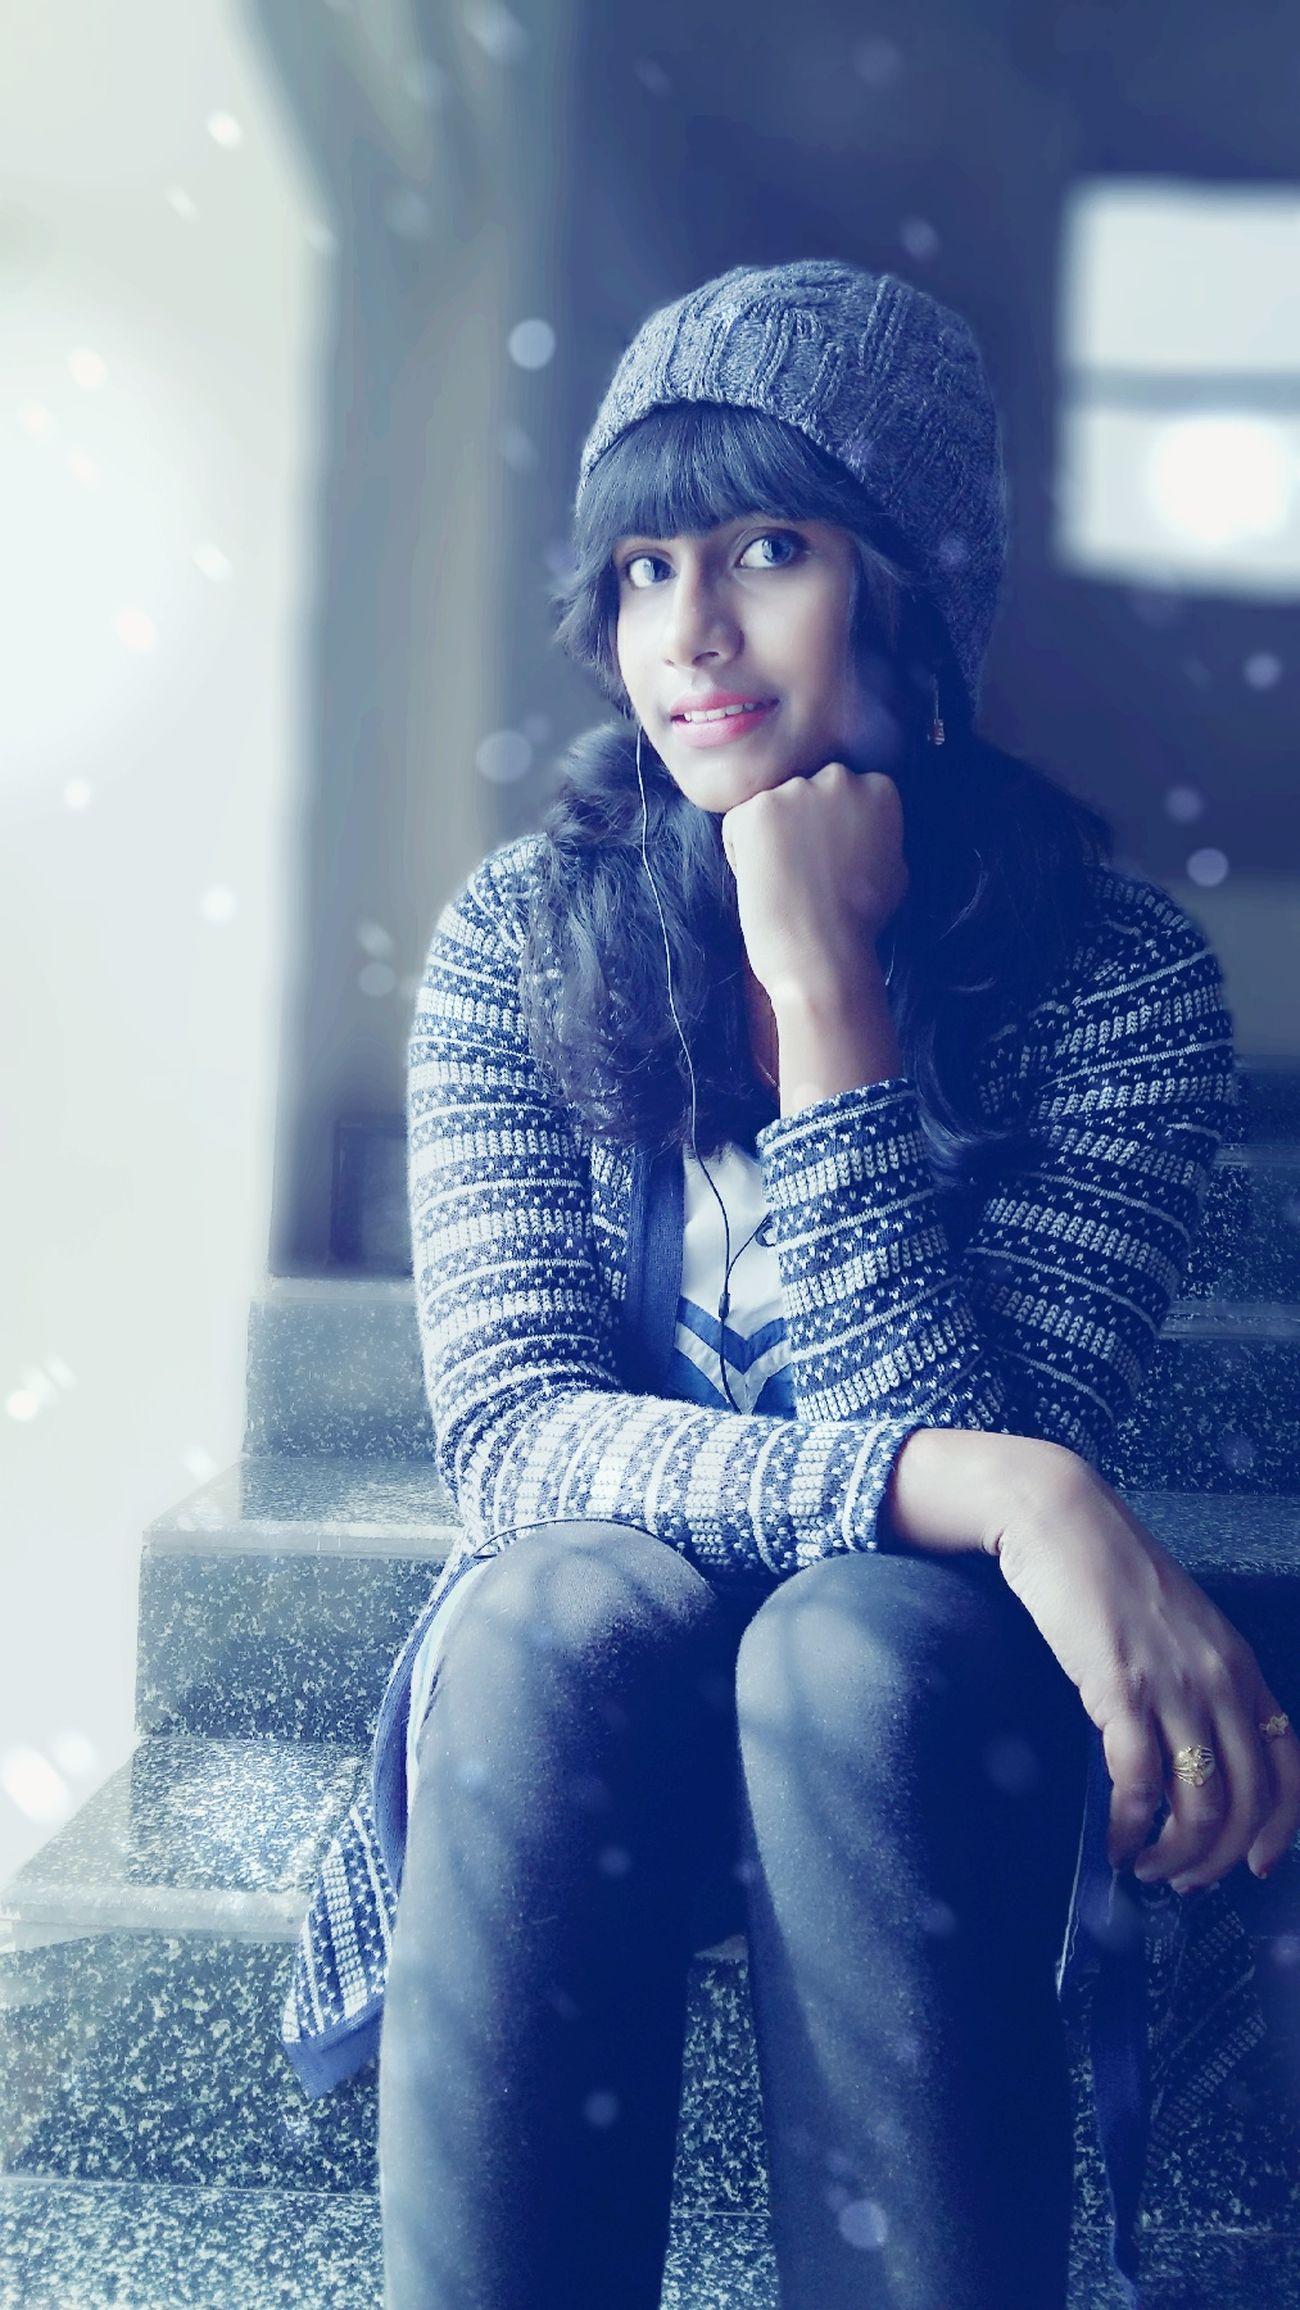 Winter Wonderland My Winter Favorites Cold Winter ❄⛄ December Goinhouttonight Looking Into The Future